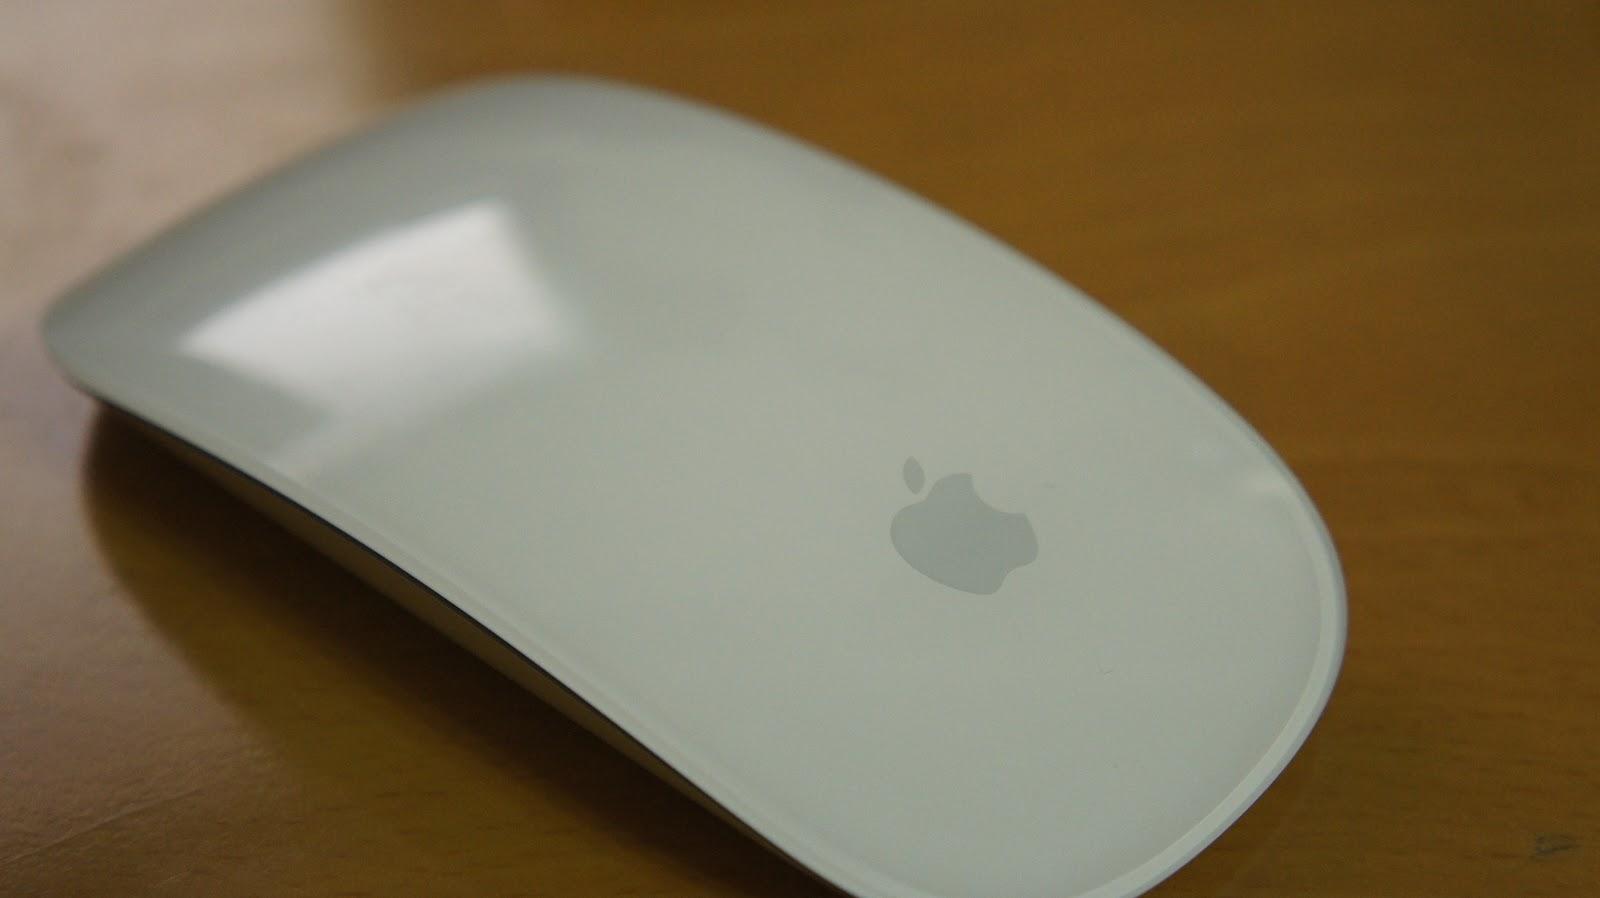 ckxken Blog: 『開箱』Apple Magic Mouse Multi-Touch 滑鼠開箱